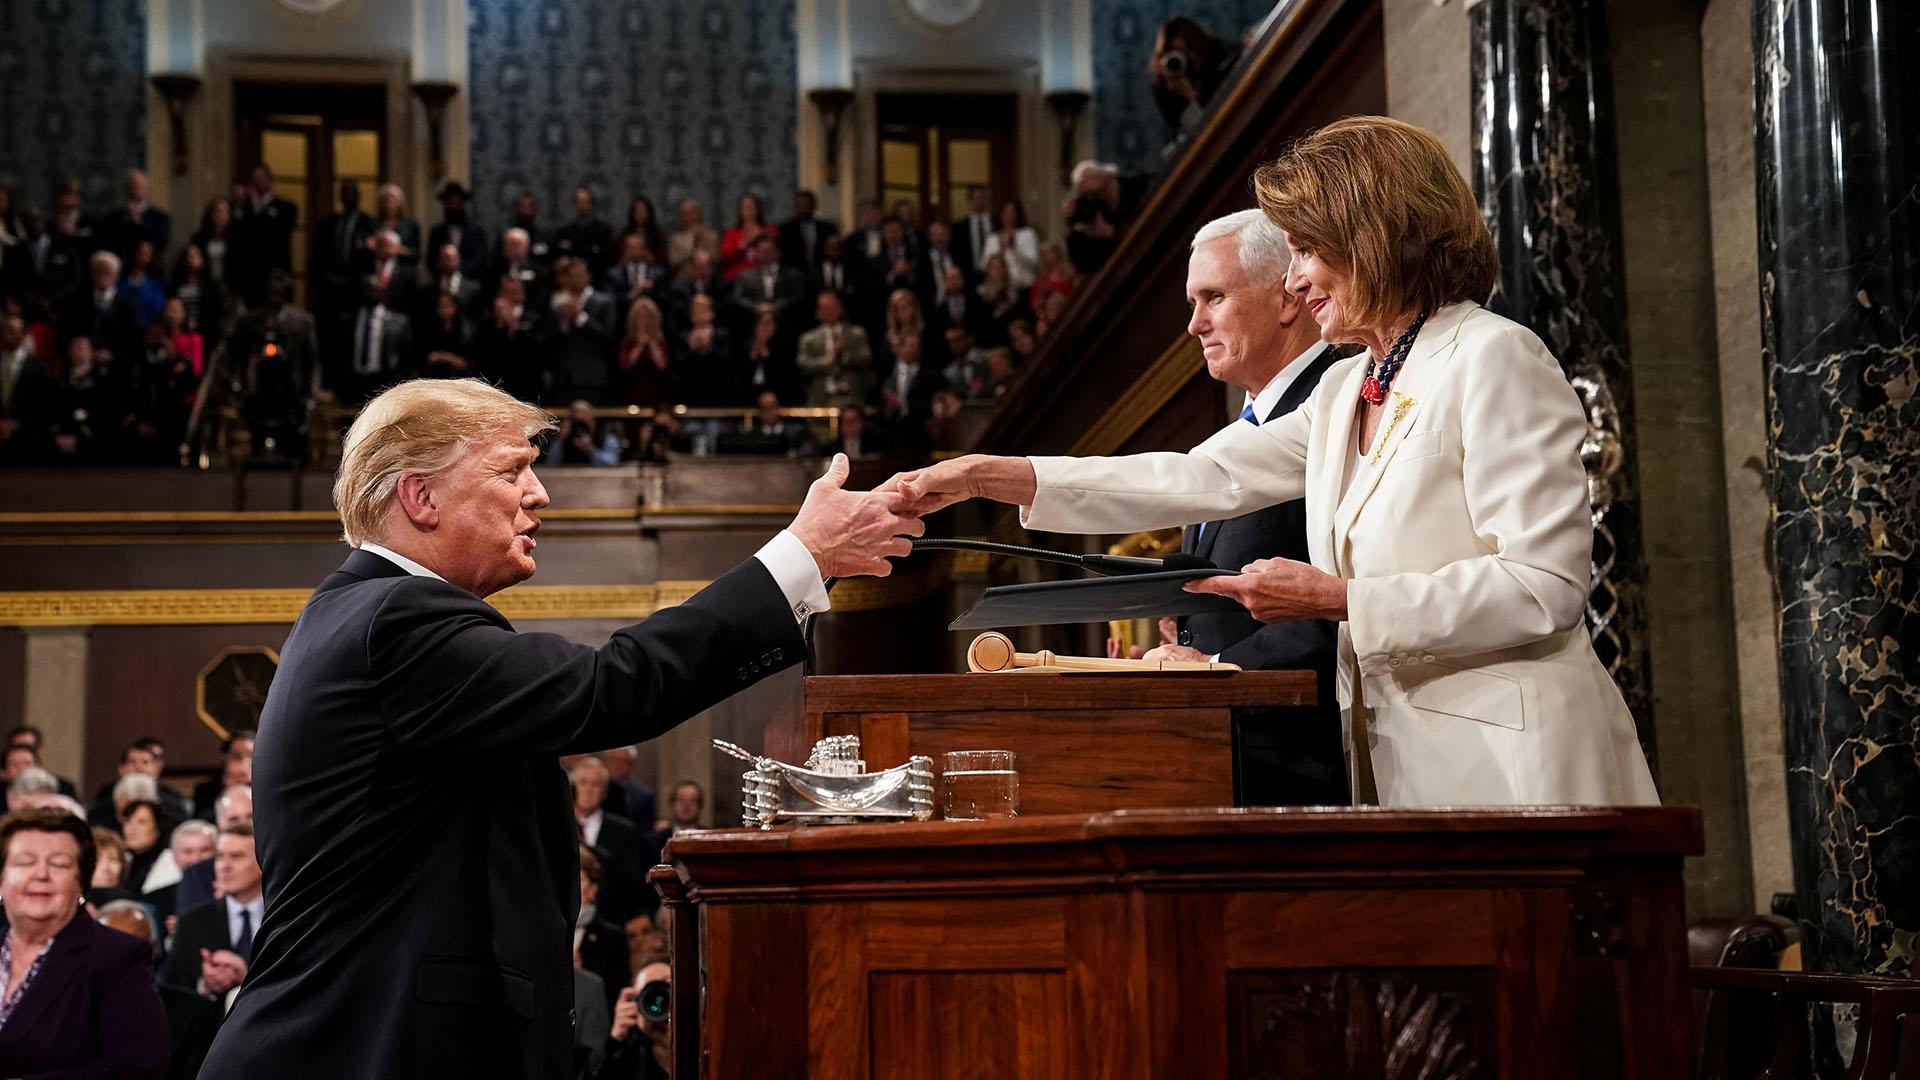 Trump salud a Pelosi en su llegada al Congreso. (Doug Mills/The New York Times/Pool via REUTERS)